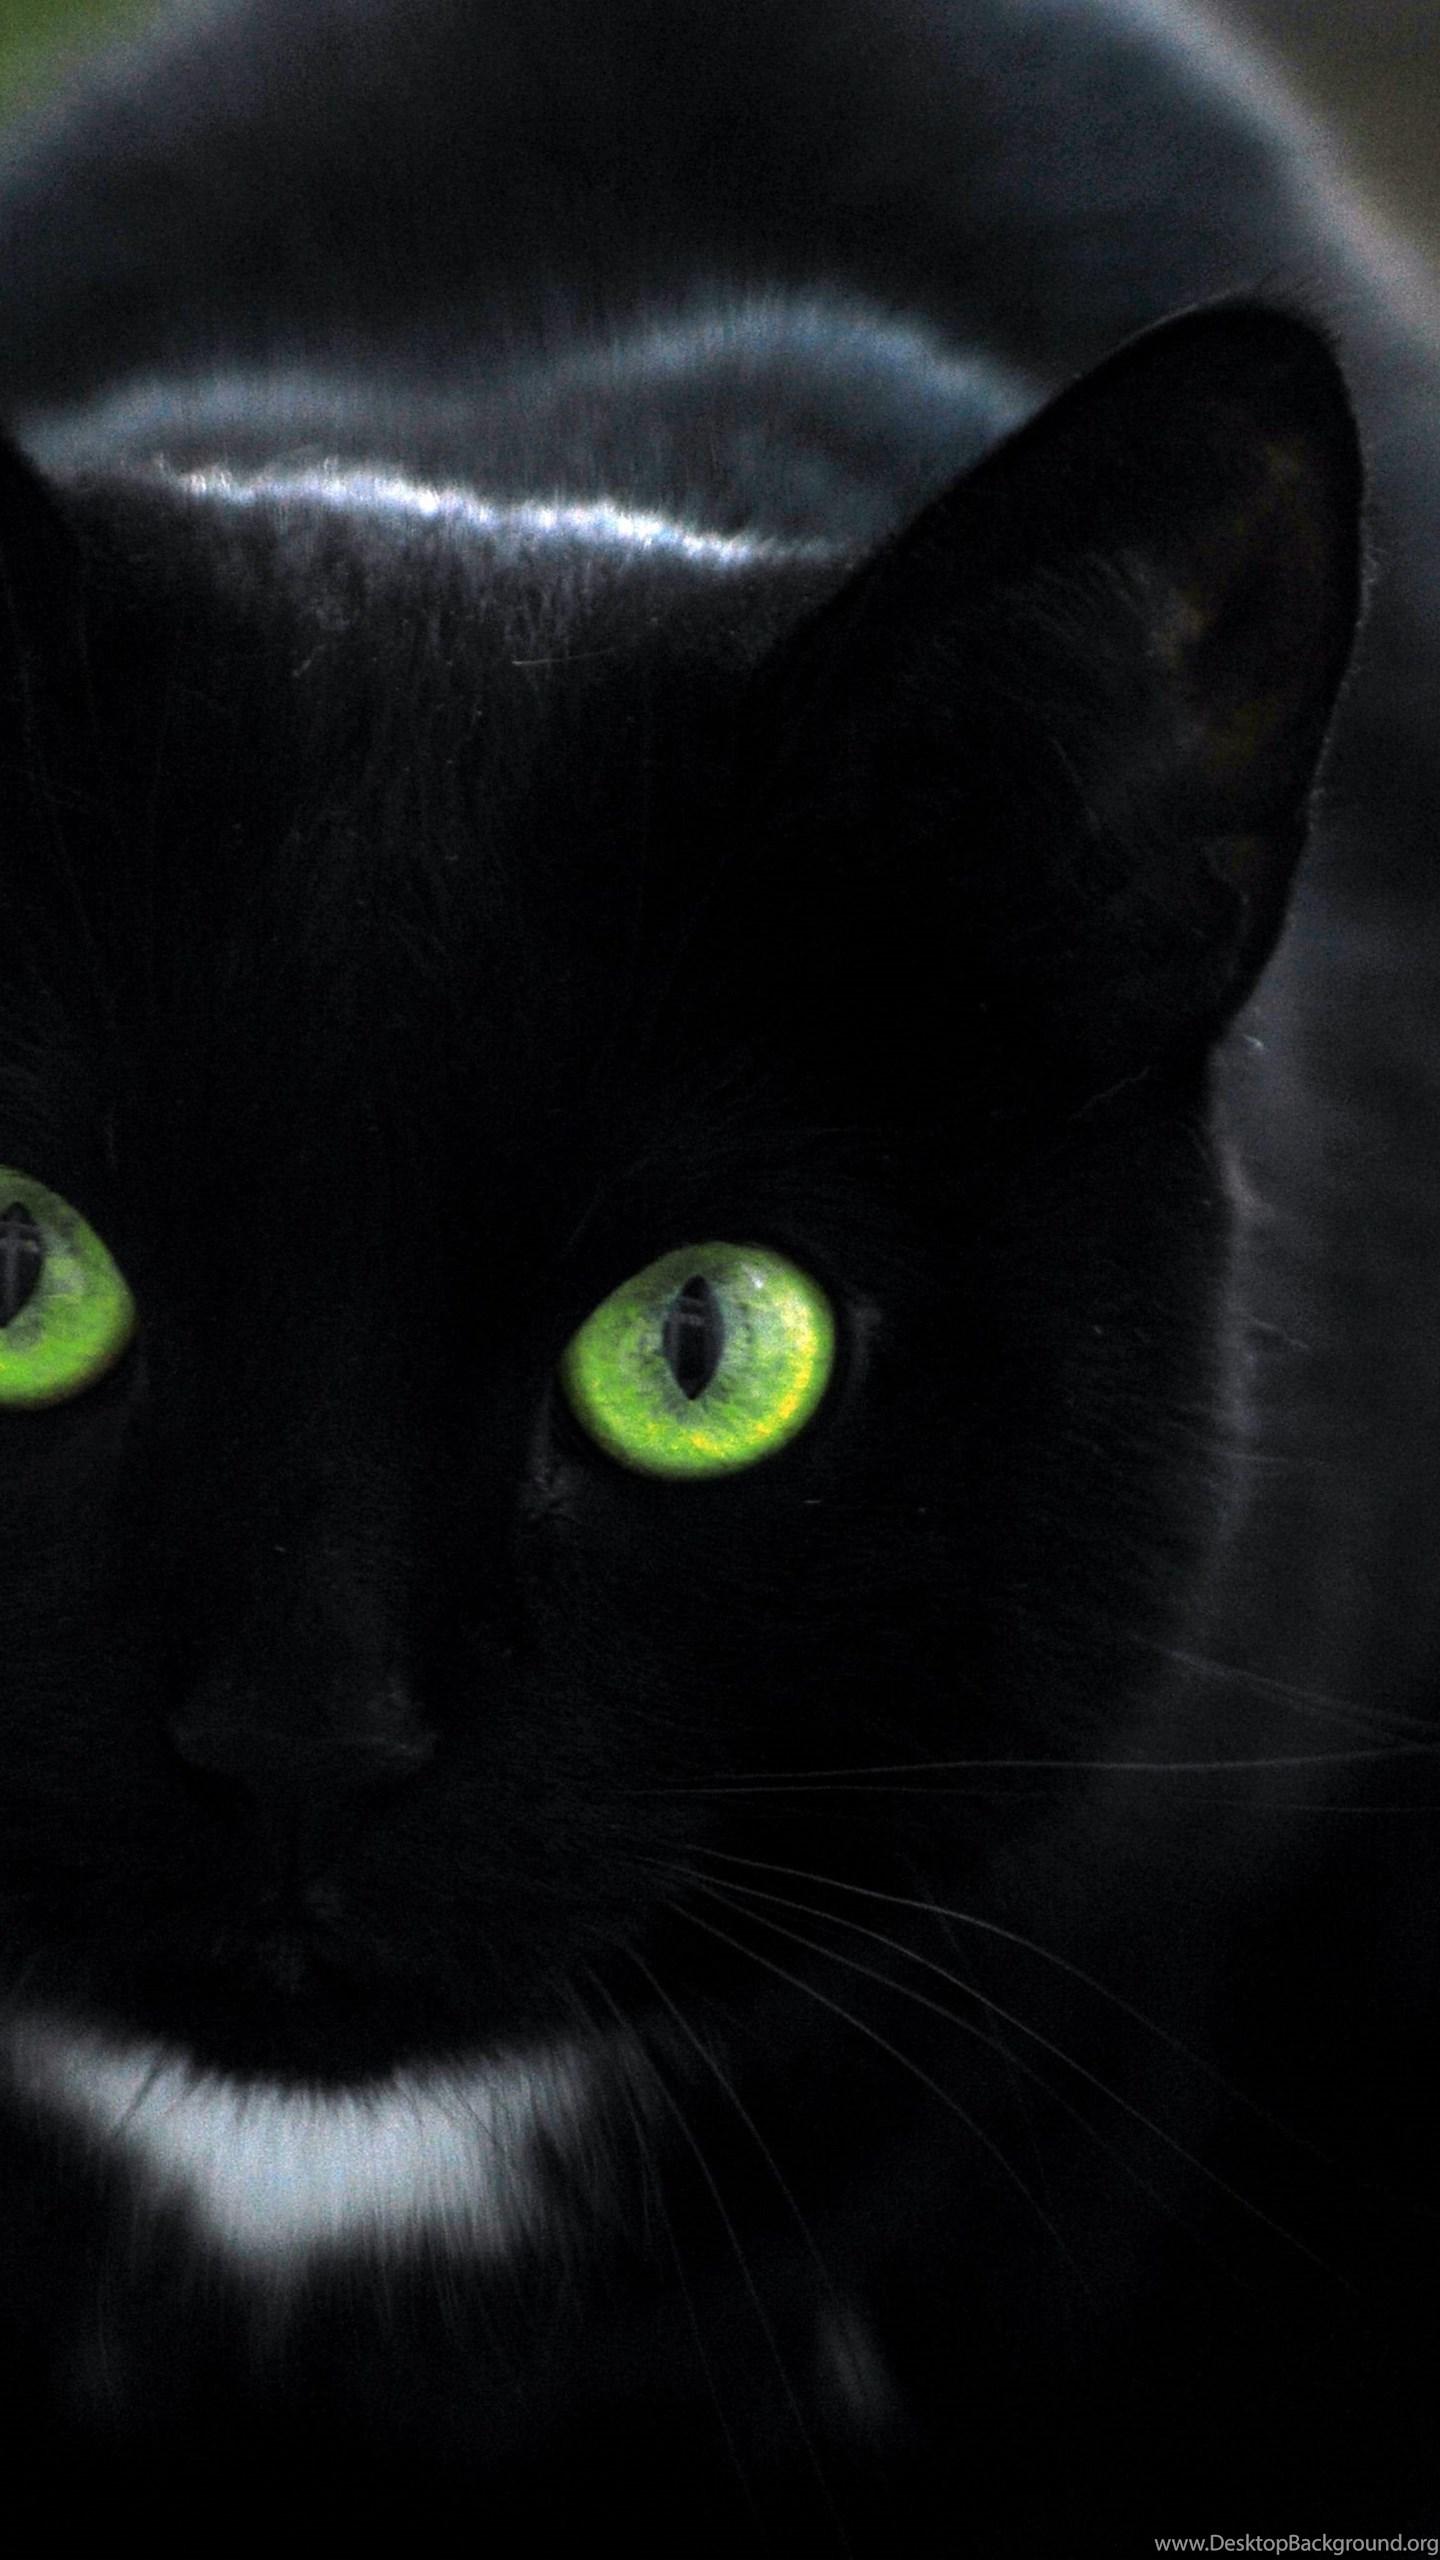 Black Cat Kitten Wallpaper Hd Cute Cat Wallpapers Desktop Background